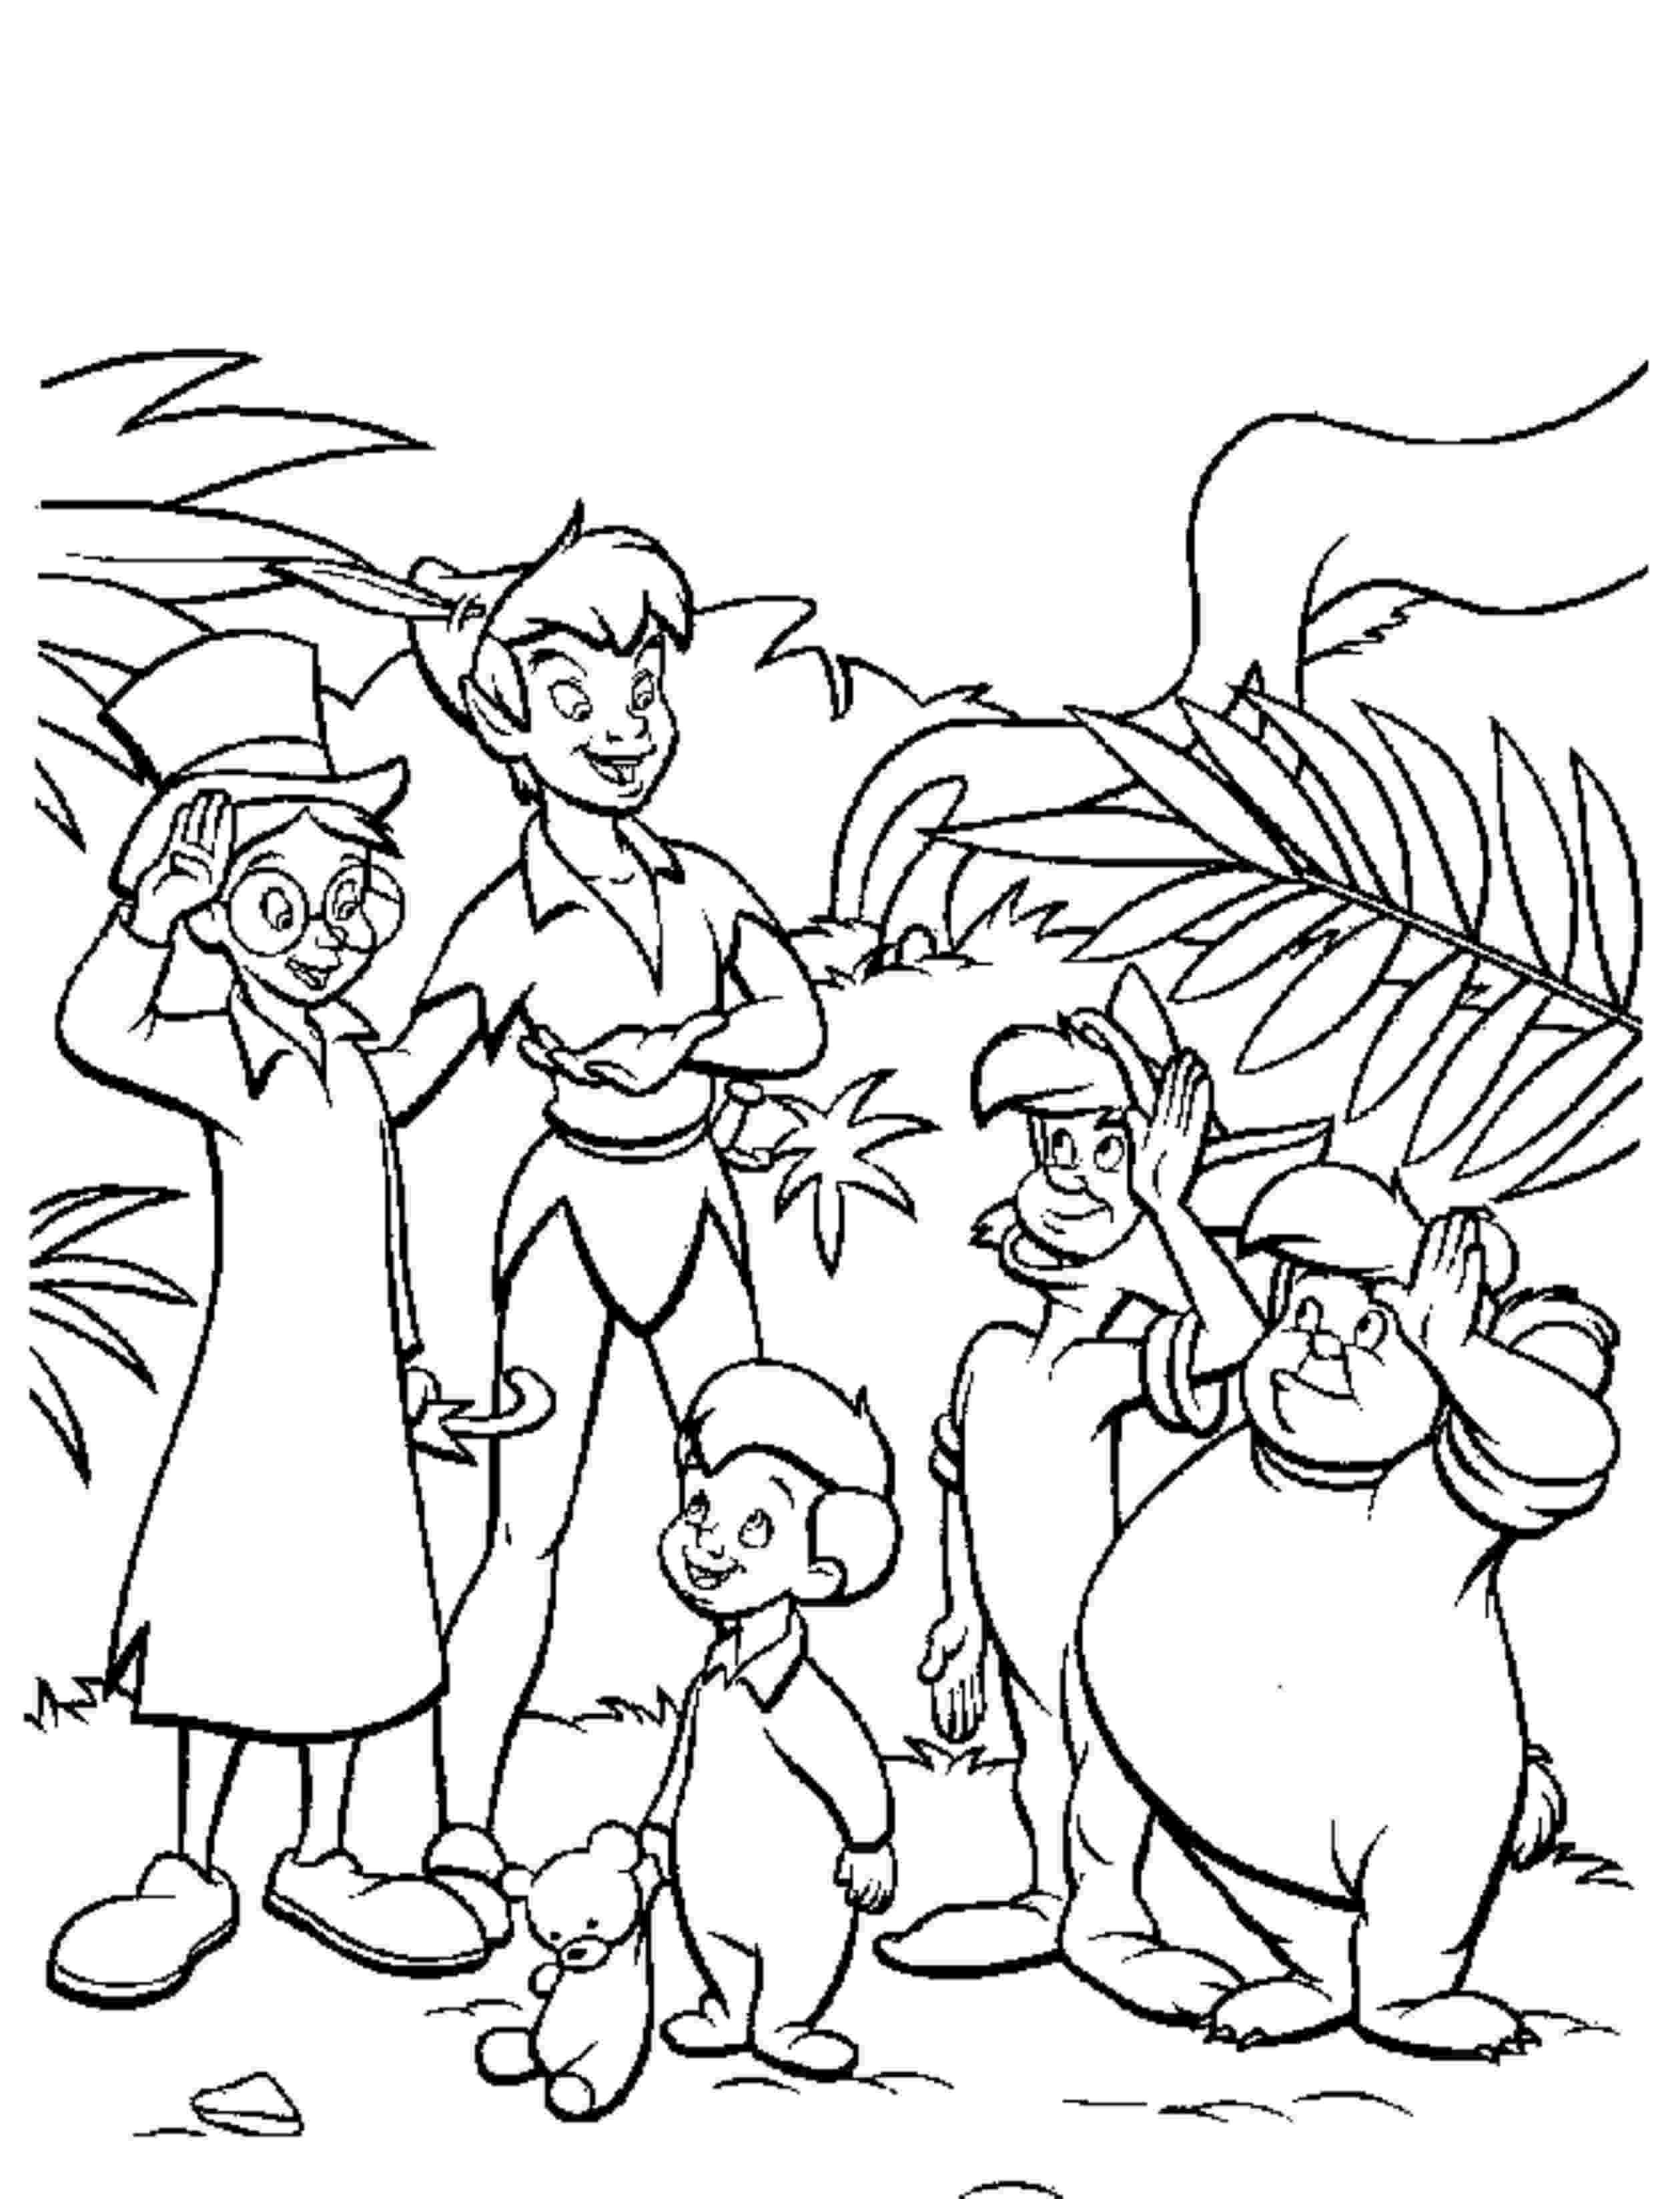 peter pan coloring pages print download fun peter pan coloring pages downloaded pan pages coloring peter